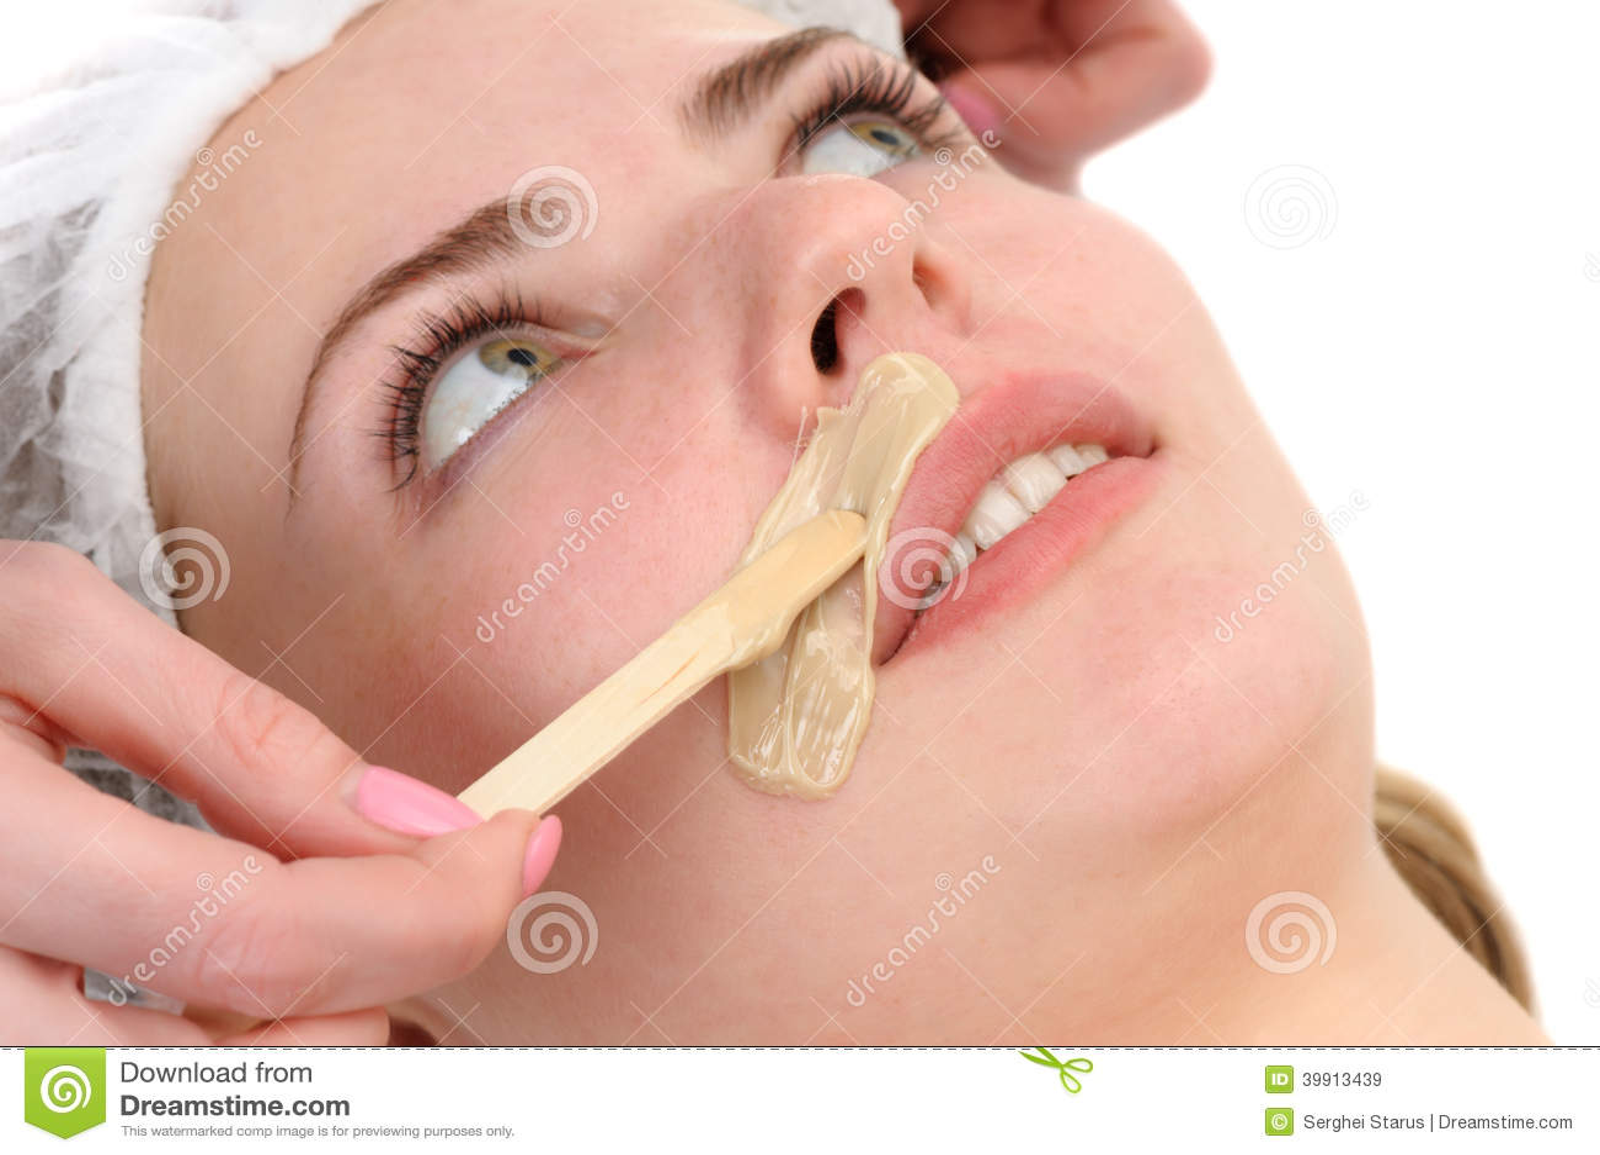 Free amateur deepthroat sex videos